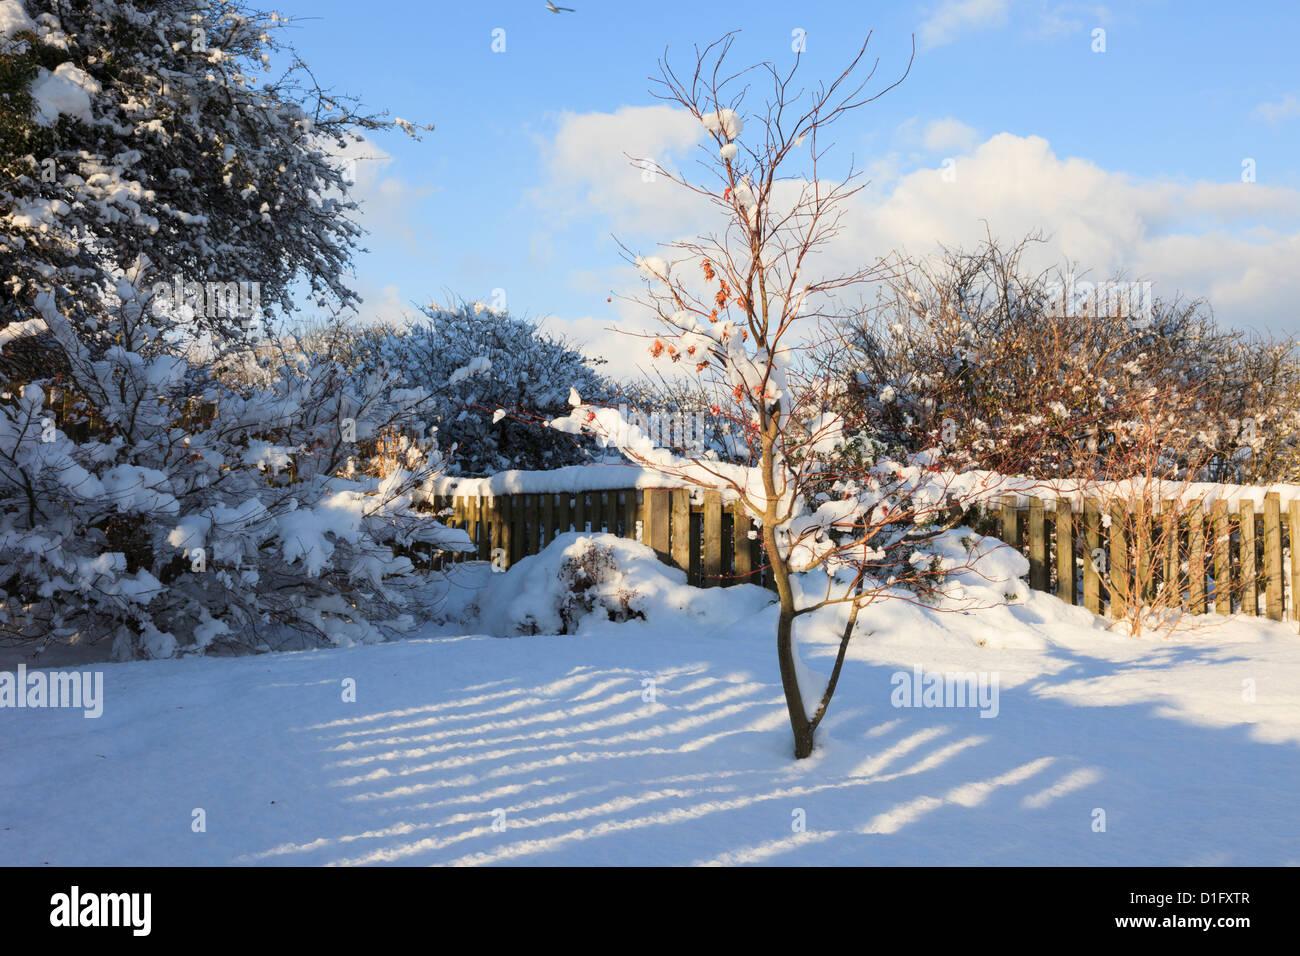 snowy garden in winter stock photos u0026 snowy garden in winter stock